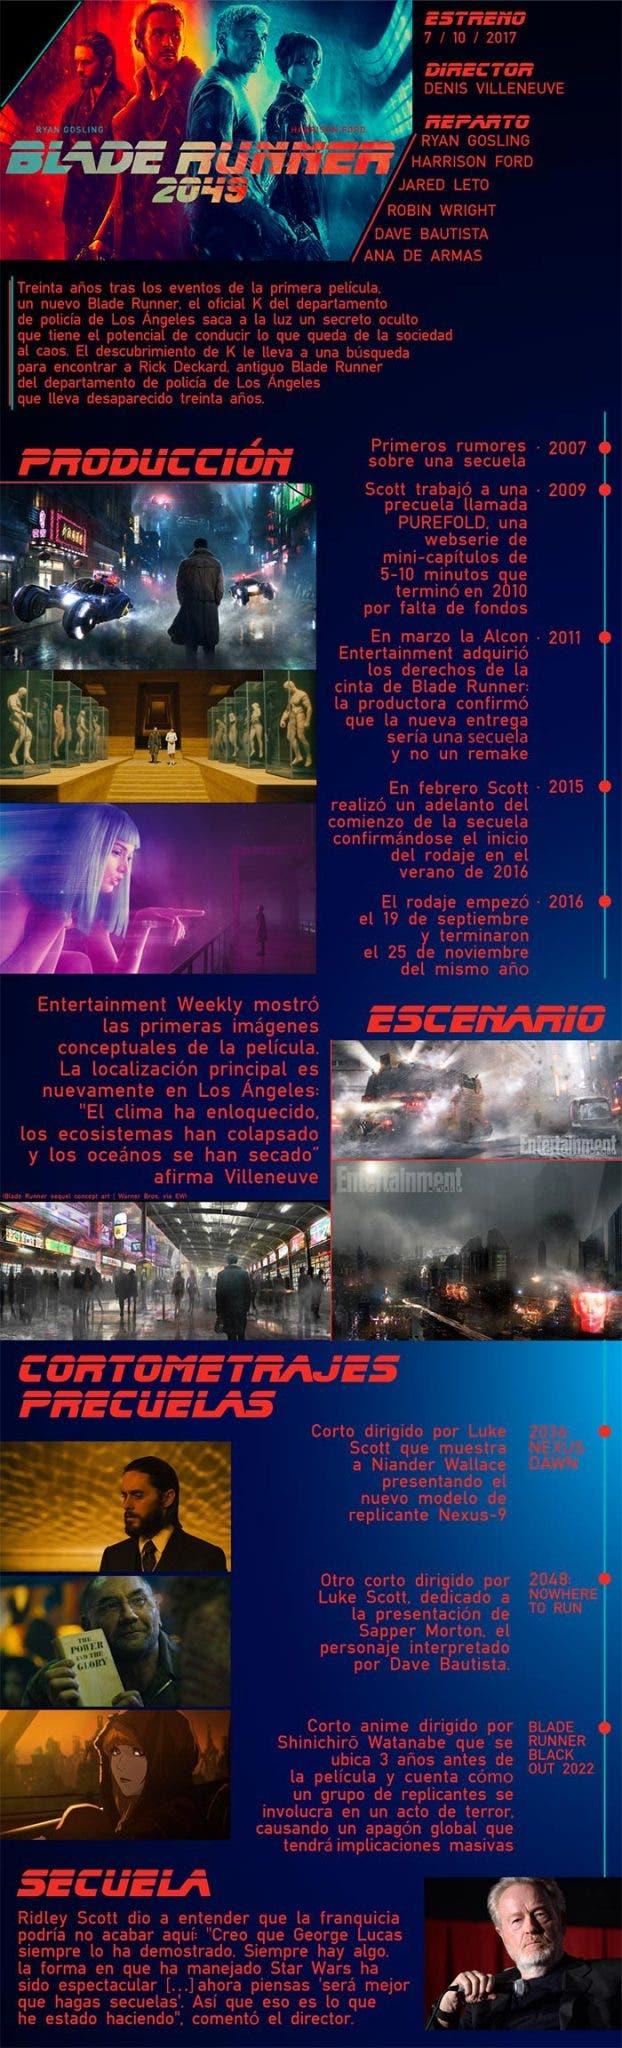 Infografía de Blade Runner 2049 (2017)